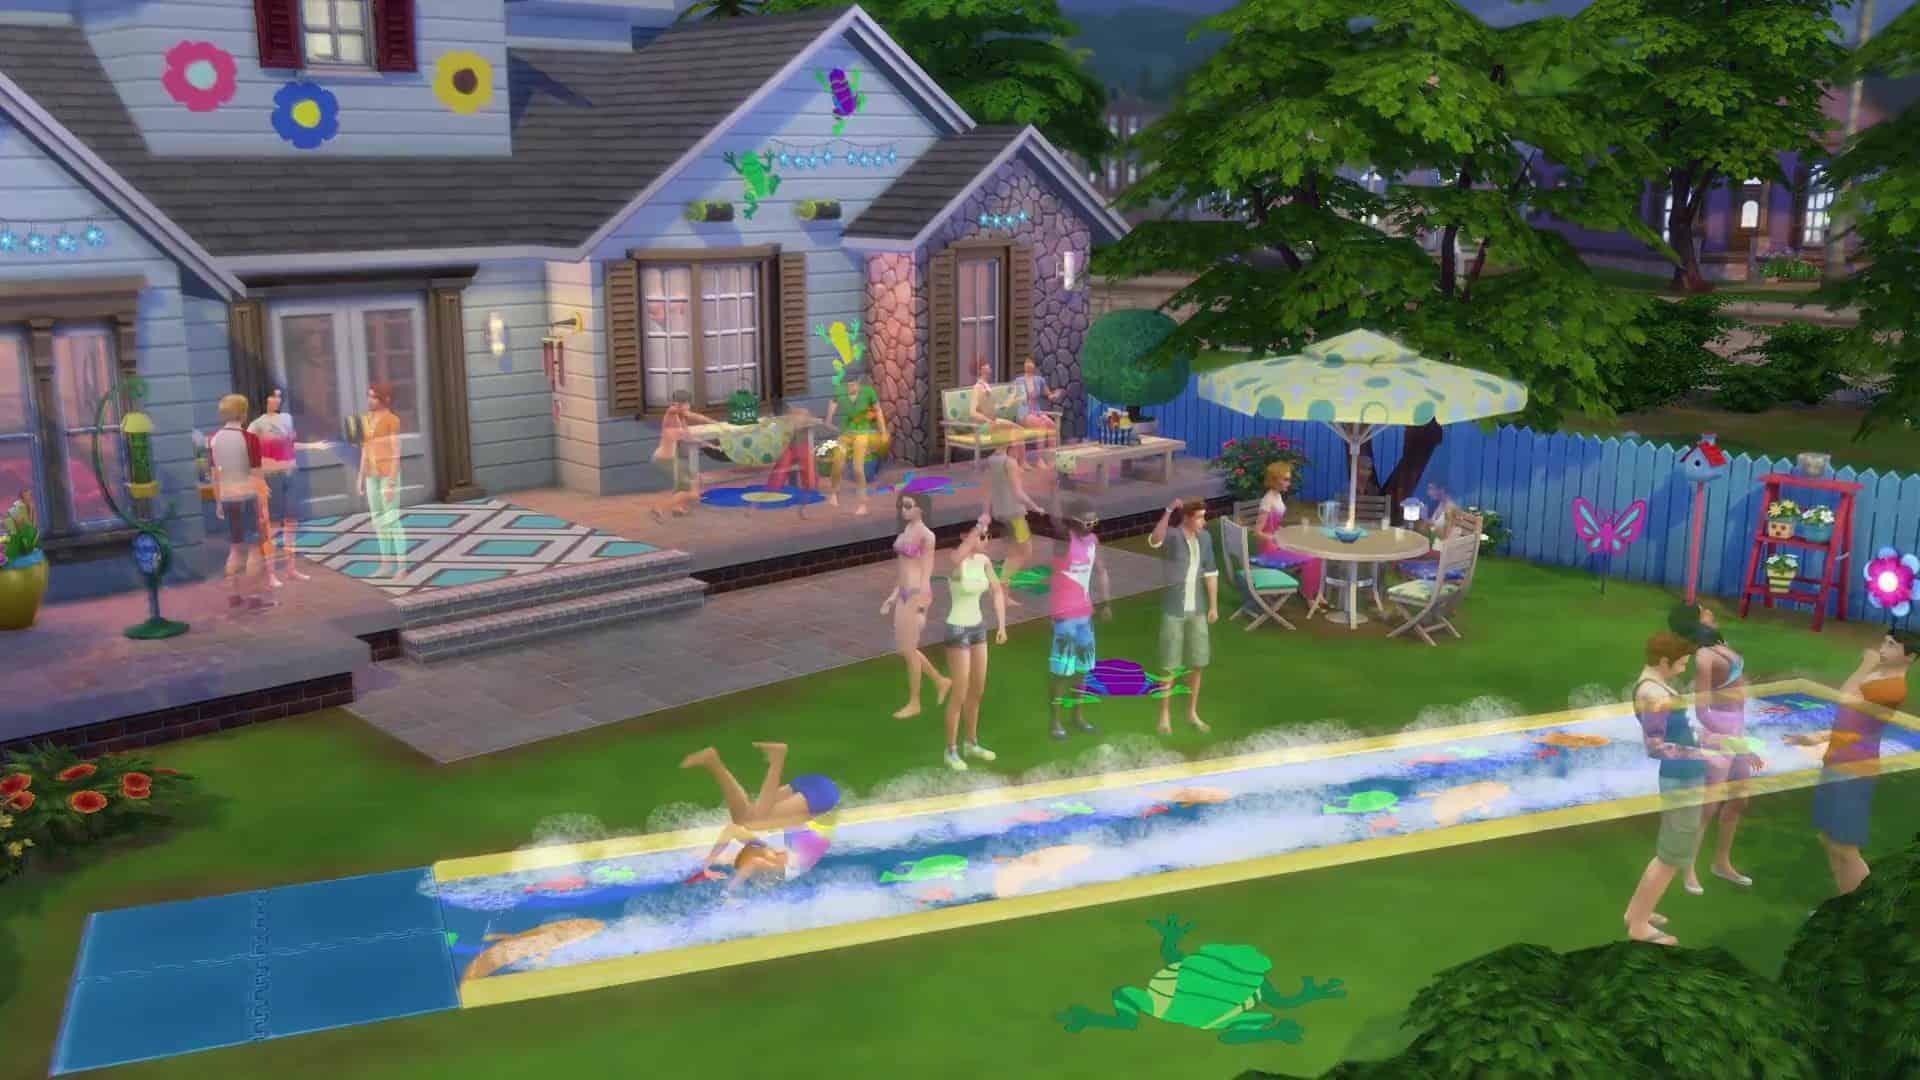 The Sims 4 Backyard Stuff Download Game